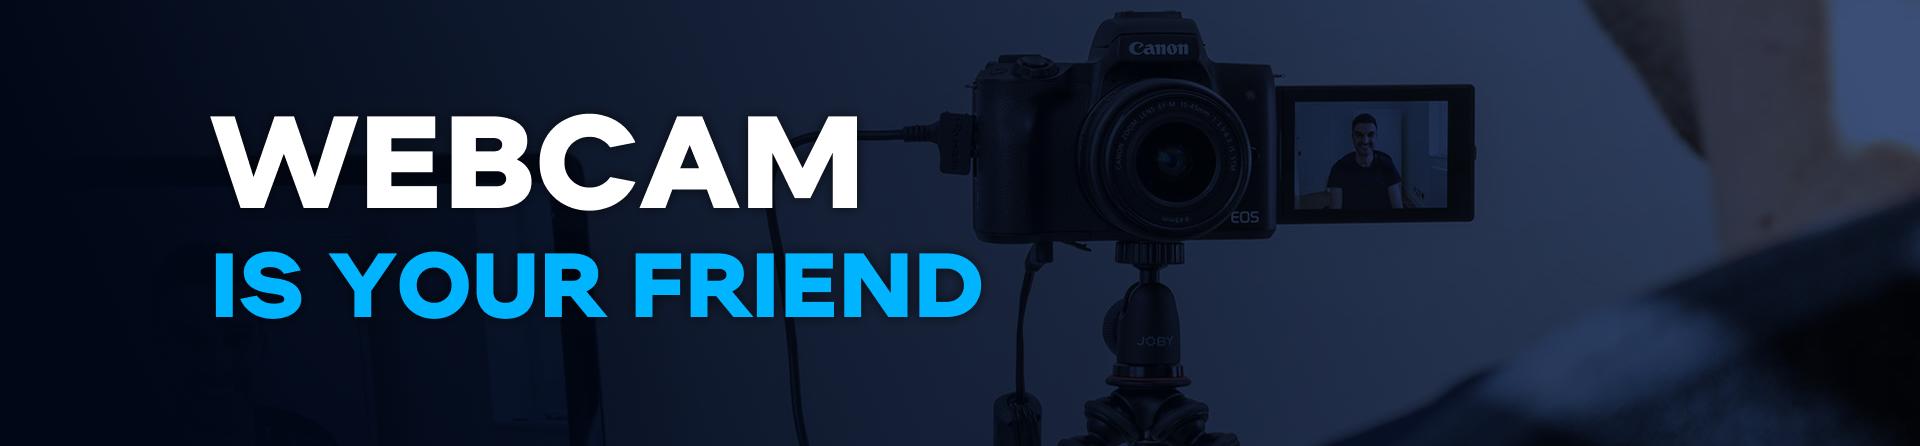 Webcam is Your friend